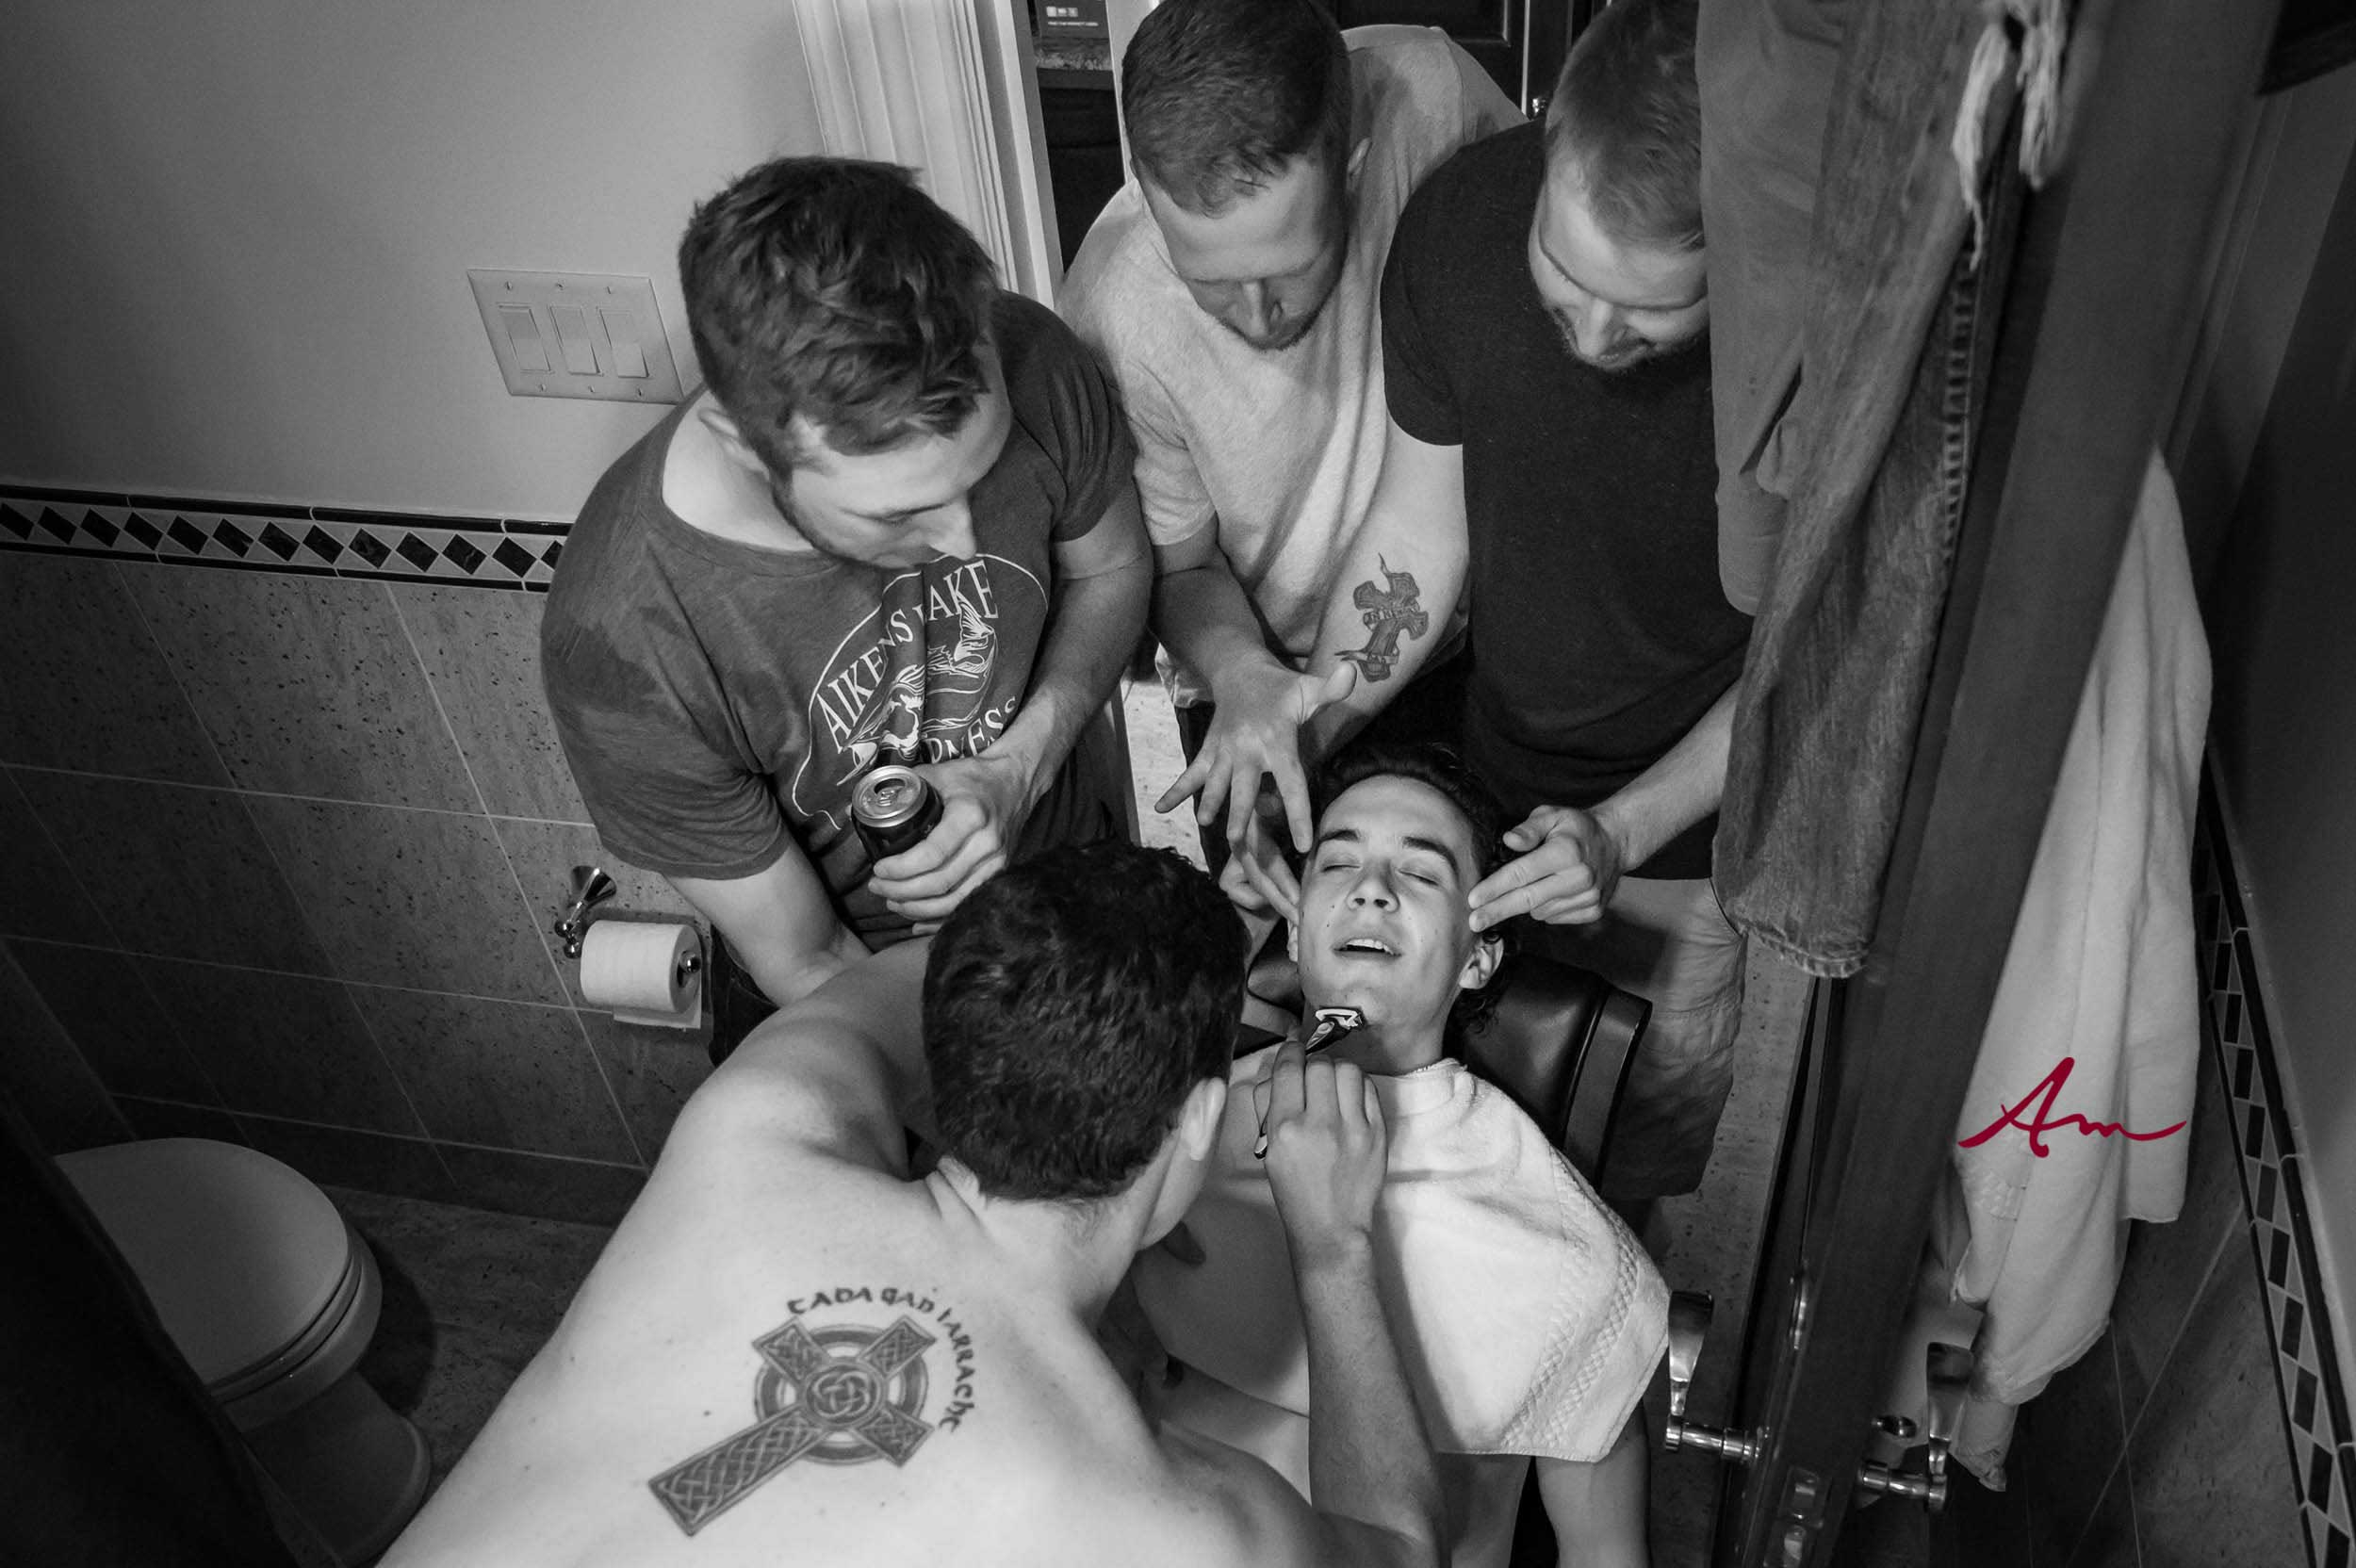 Fox-Harb'r-Wedding-Guys-Shave.jpg